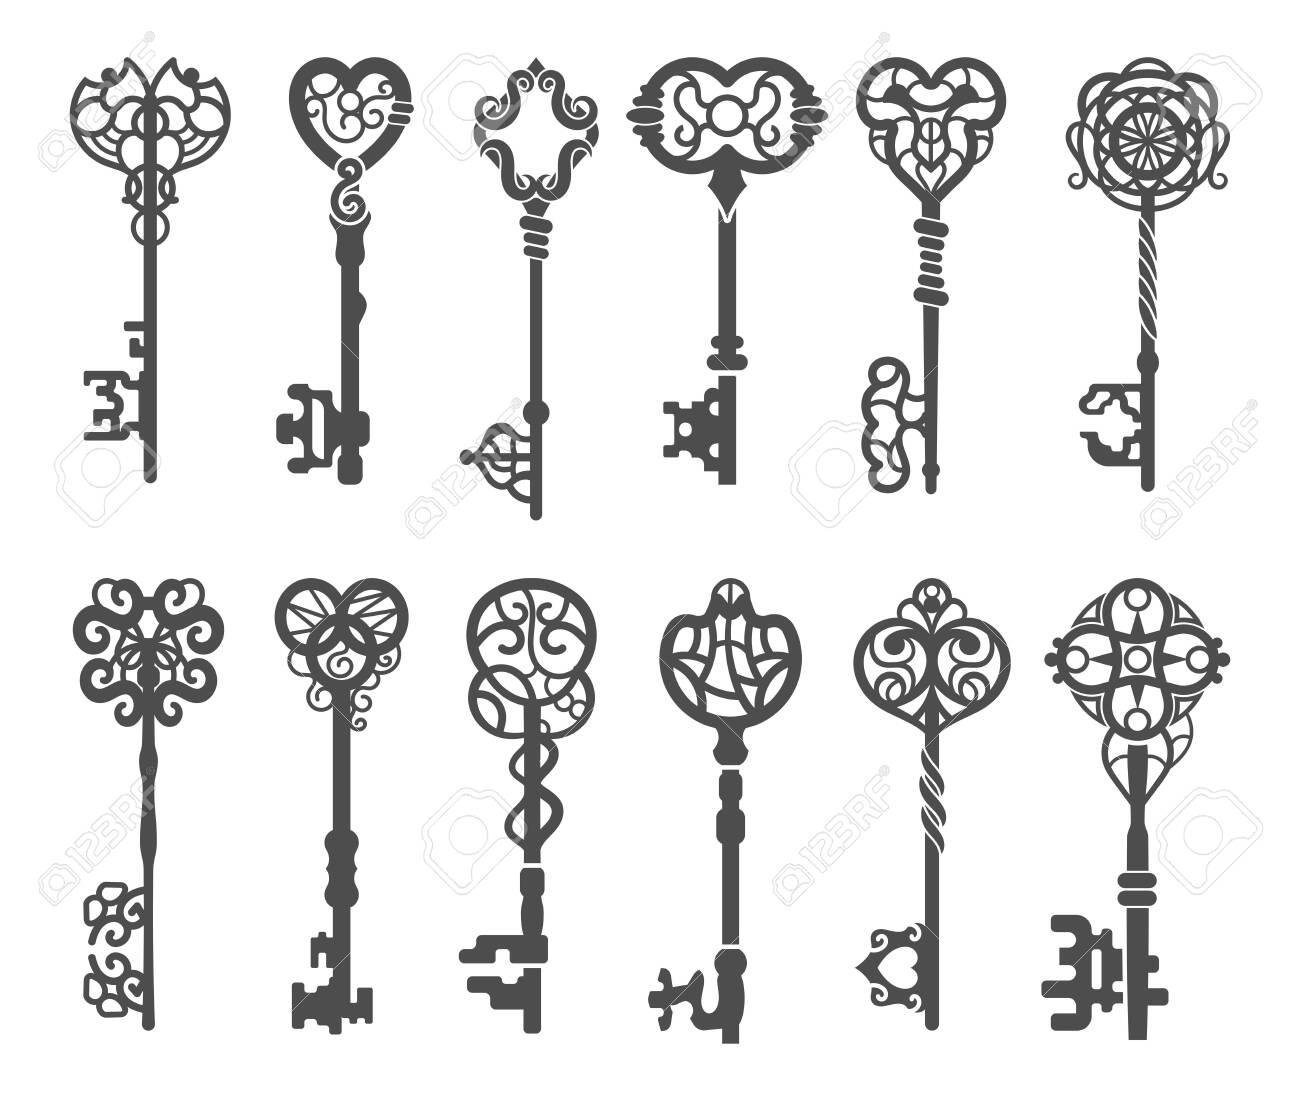 Vintage key silhouette or victorian skeleton key - 138735683